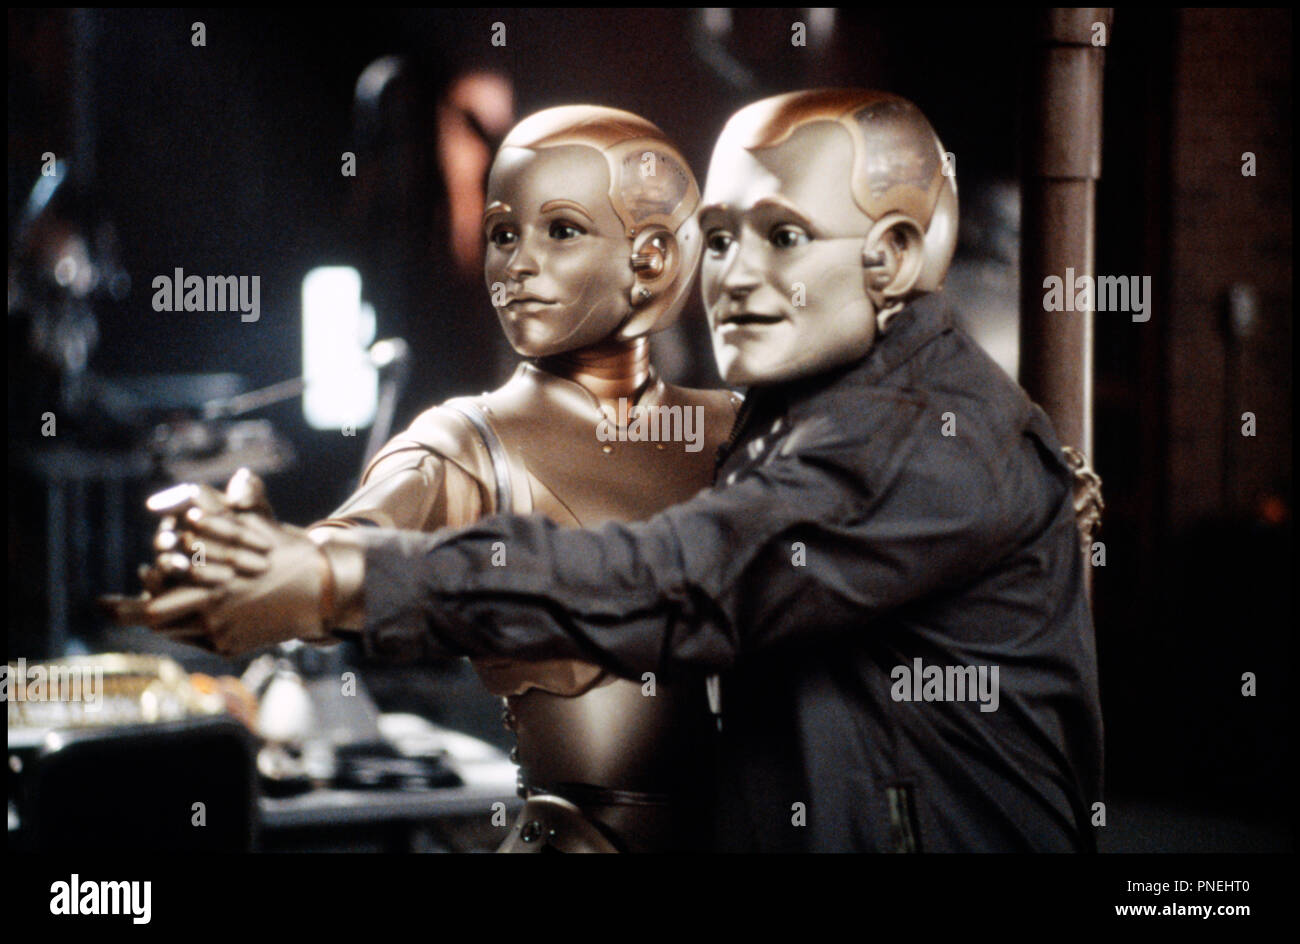 Prod DB © Columbia / DR L'HOMME BICENTENAIRE (BICENTENNIAL MAN) de Chris Columbus 1999 USA avec Robin Williams robots, couple, danse, tango d'apres le roman de Isaac Asimov - Stock Image